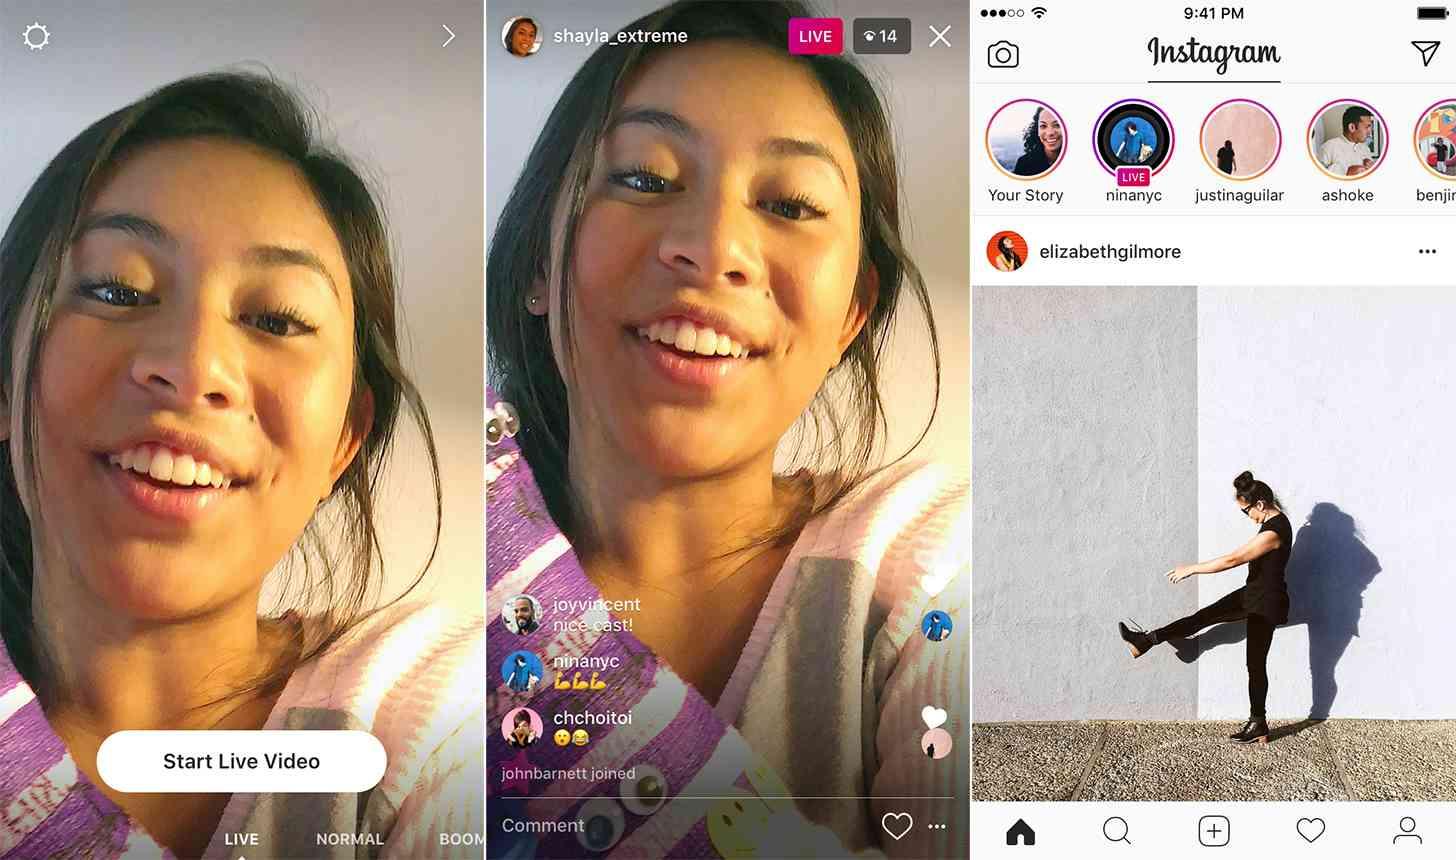 Instagram live video streaming